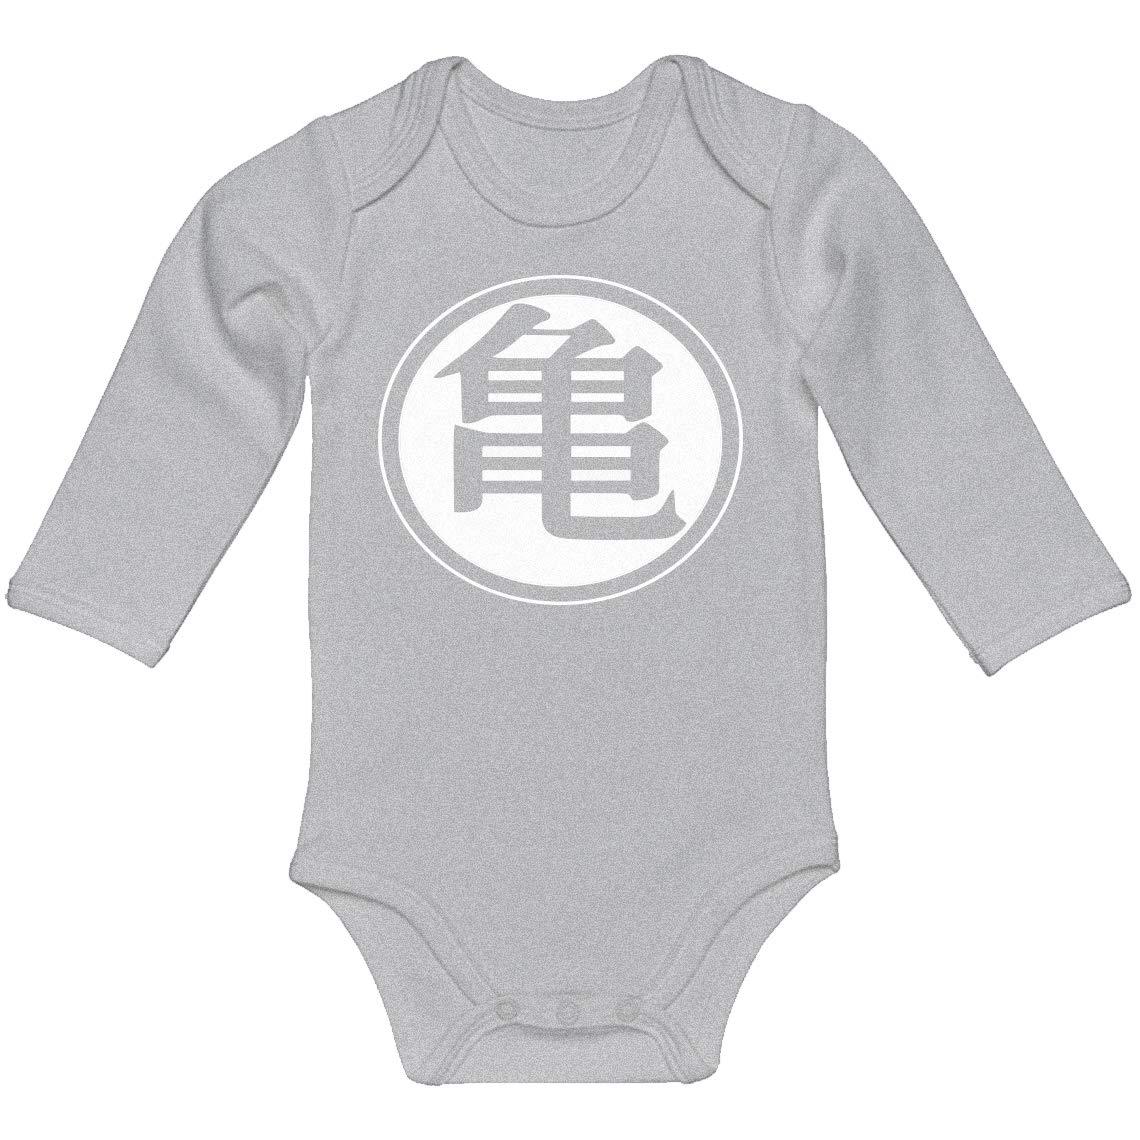 100/% Cotton Knit Baby Musician Print Baby Short Sleeve Kimono Onesie Romper